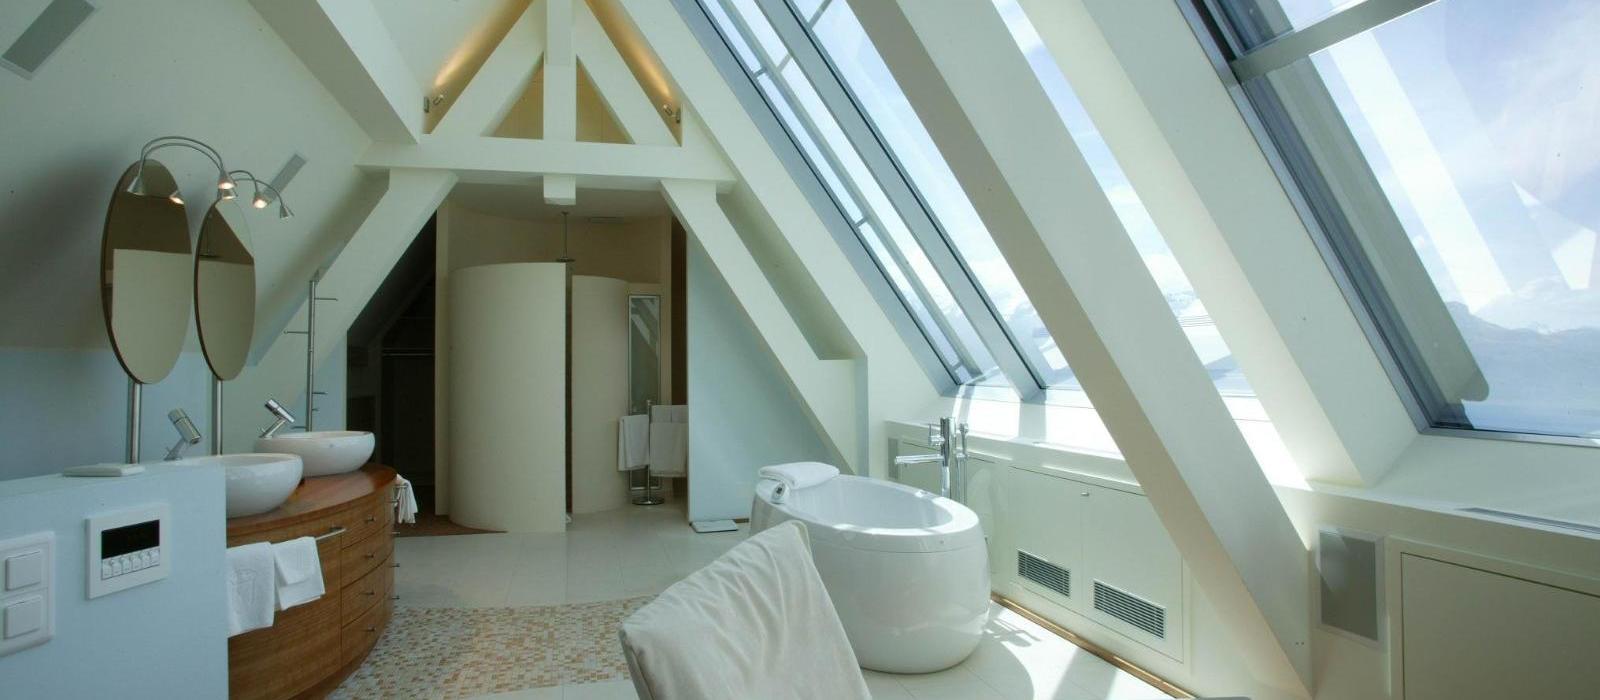 米兰朵度假酒店及Spa(Le Mirador Resort and Spa) 豪华复式套房图片  www.lhw.cn